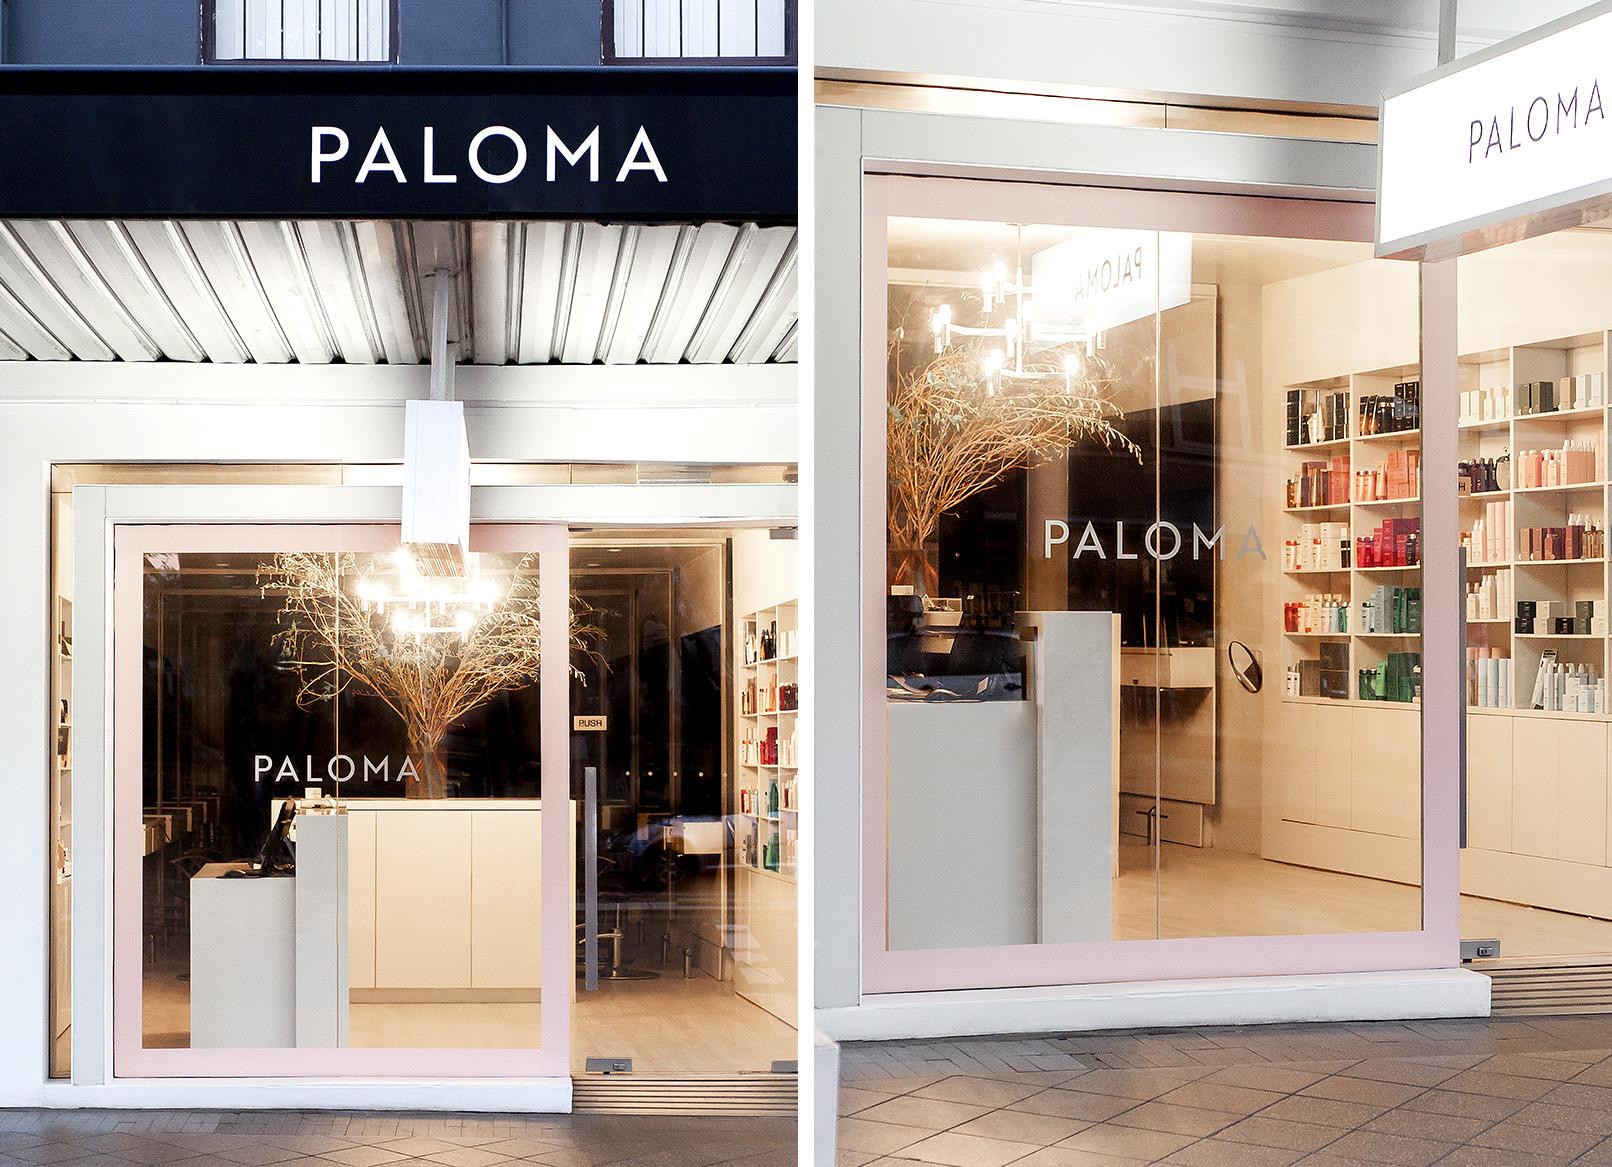 Paloma Storefront 2.jpg